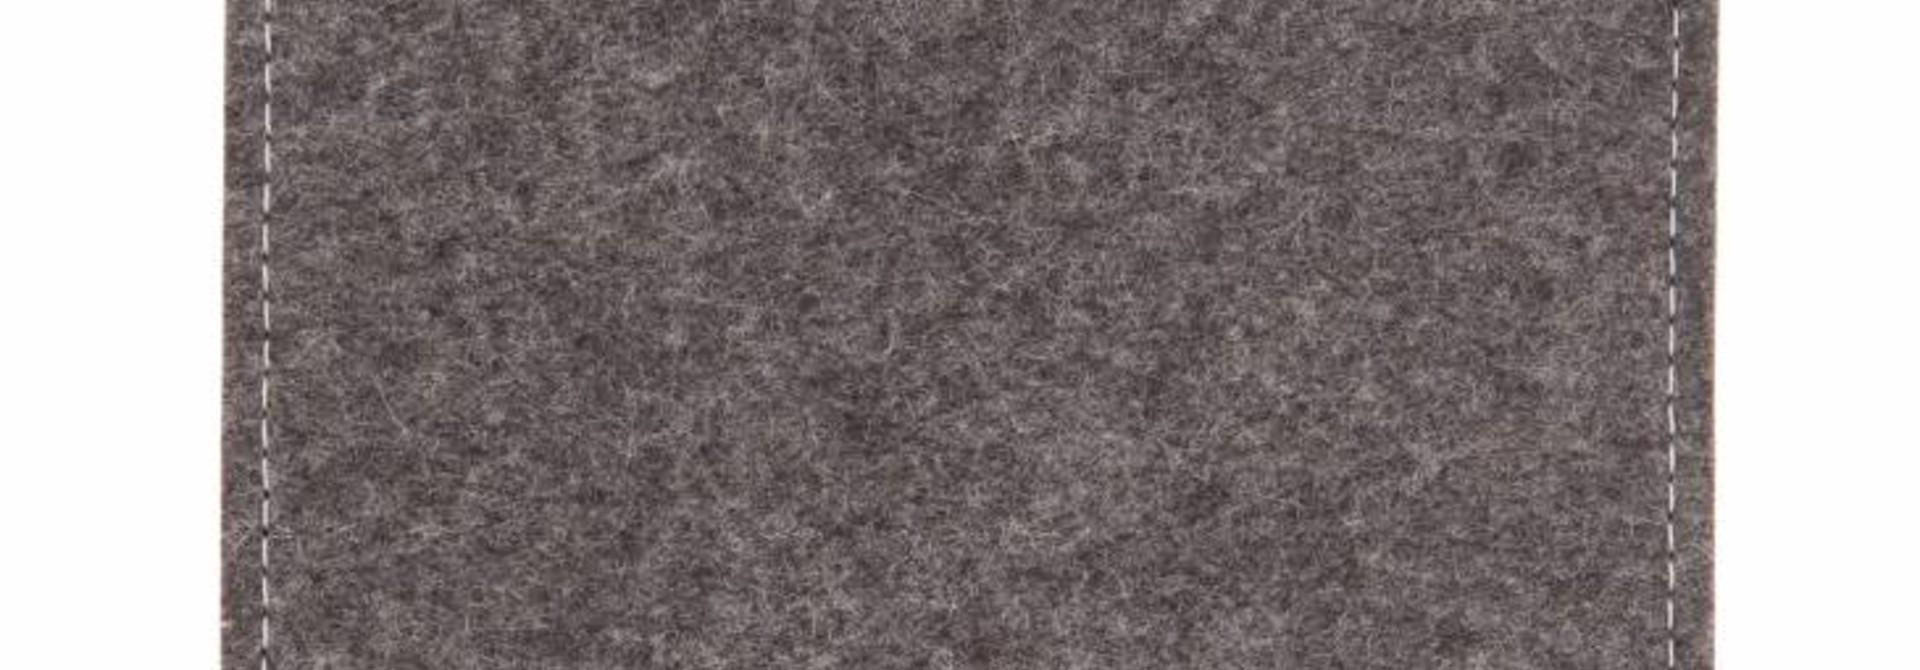 Portable SSD Sleeve Grey